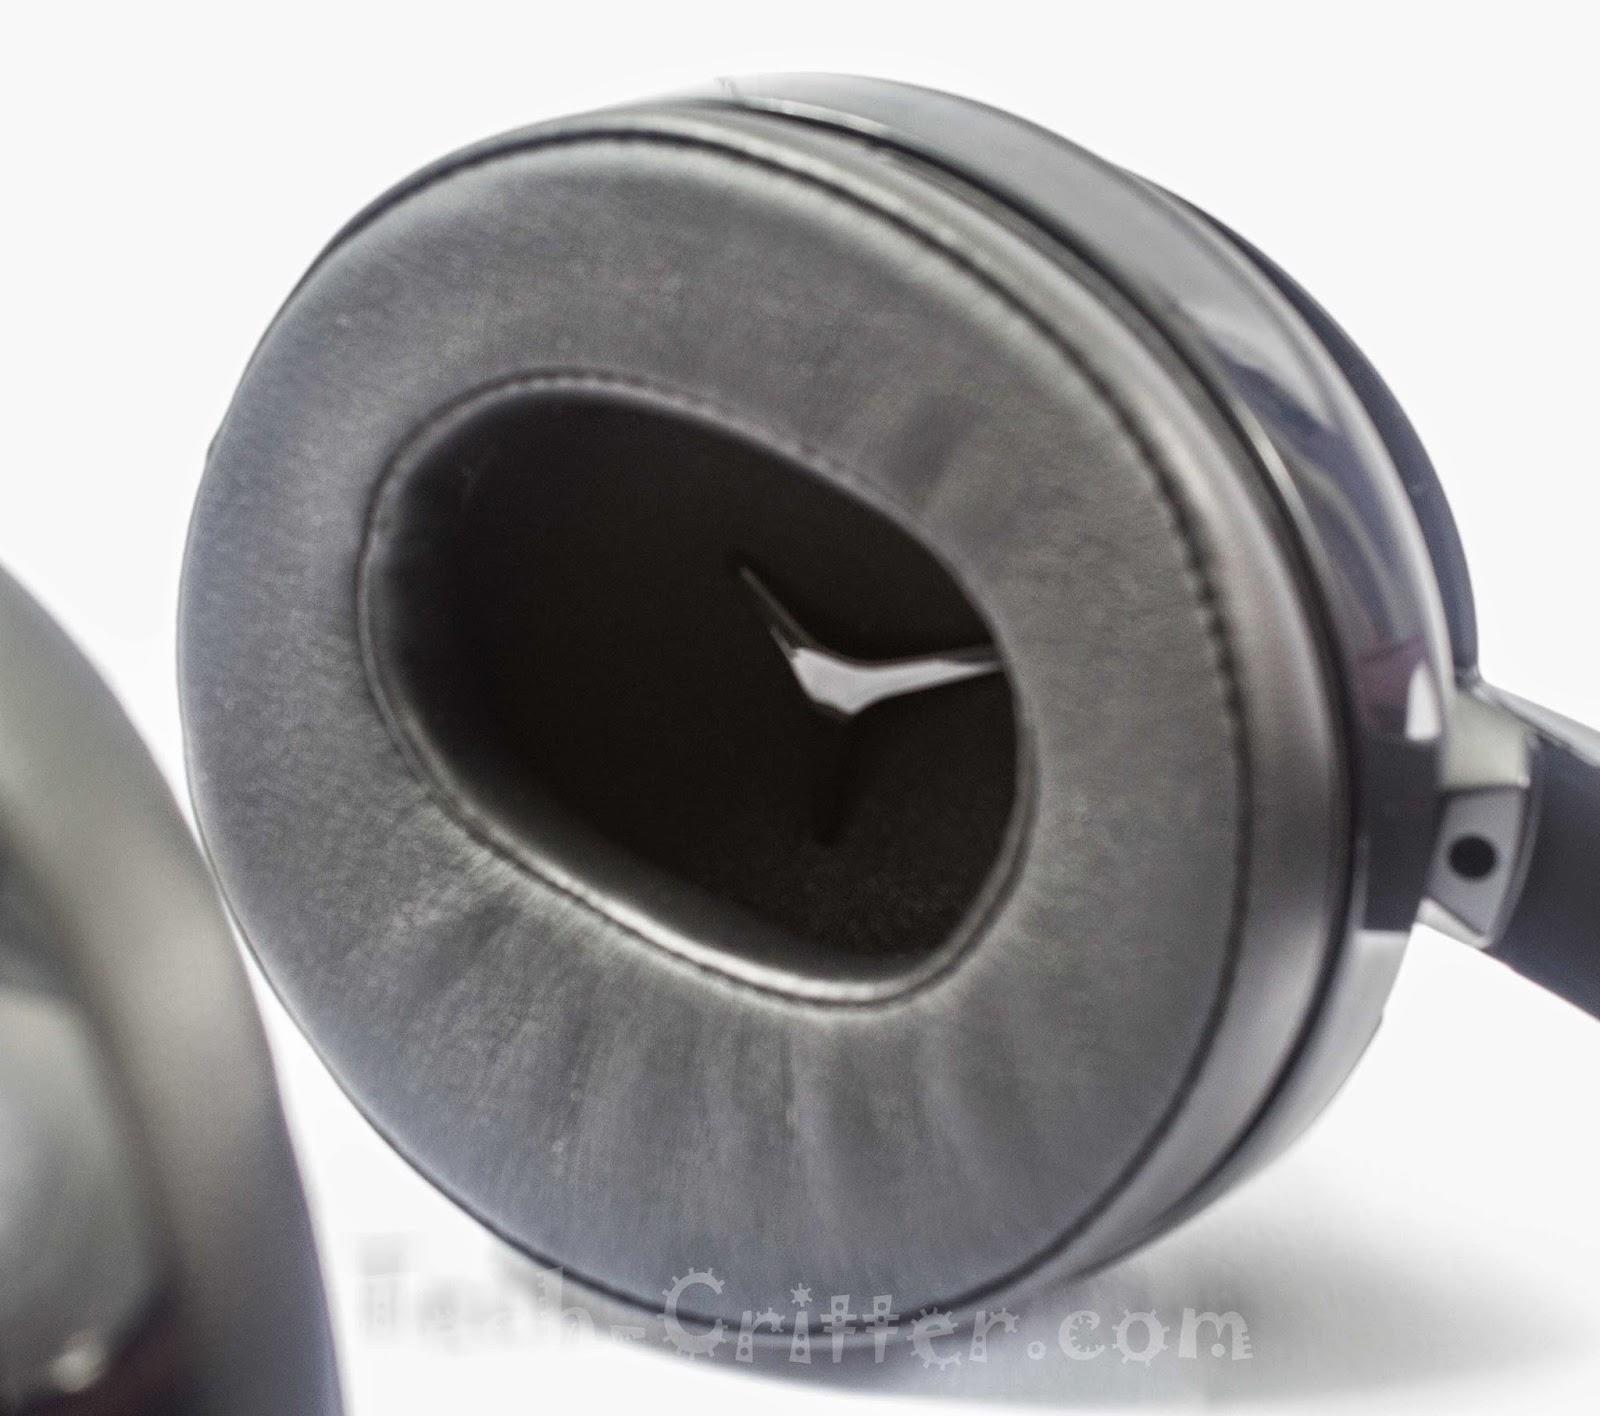 Unboxing & Review: Roccat Kave XTD 5.1 Digital Surround Sound Headset 69